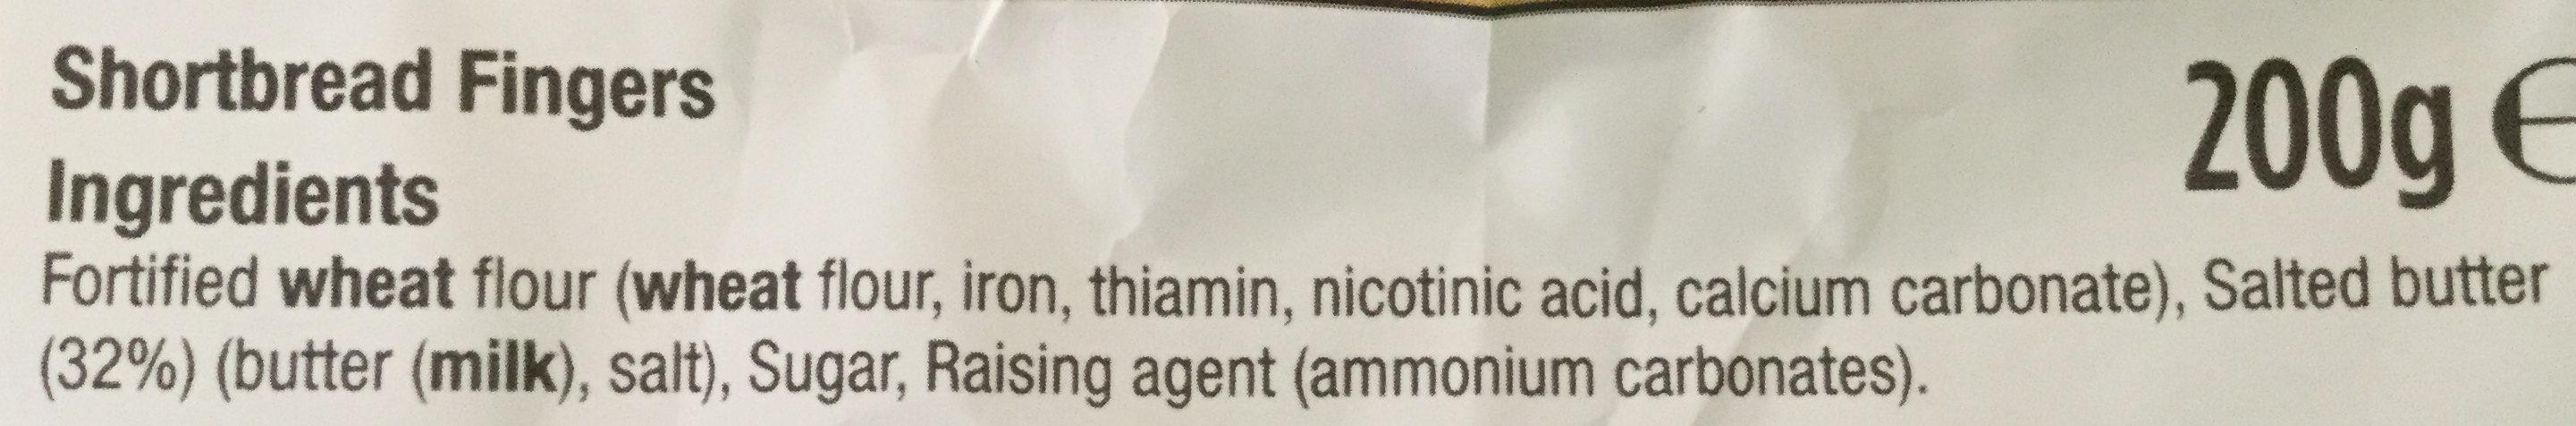 All Butter Shortbread Fingers - Ingredients